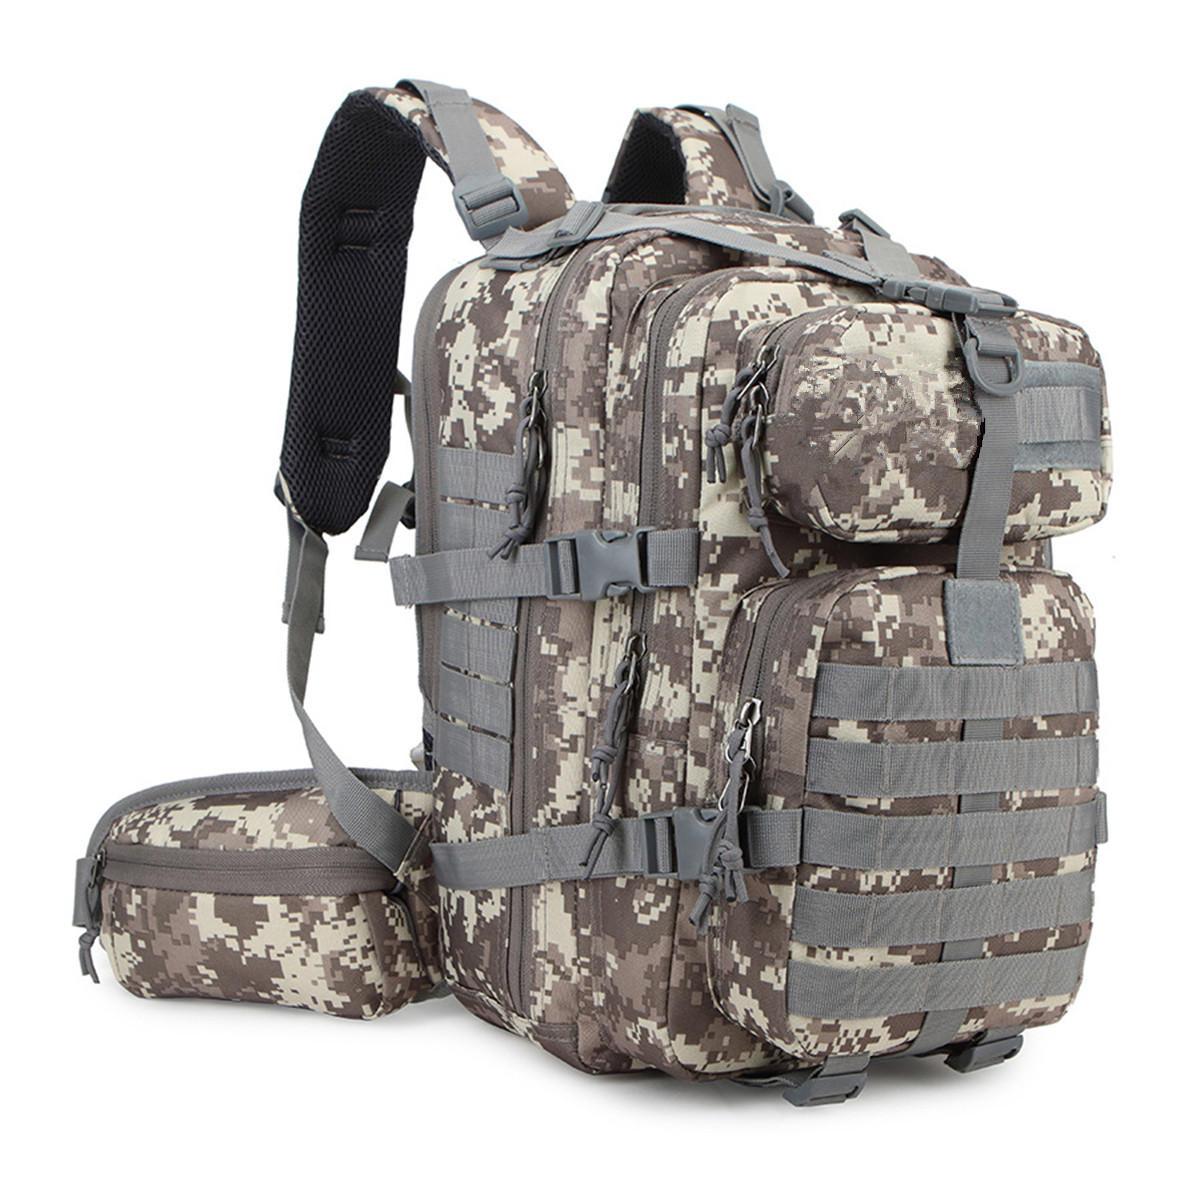 35L Military Tactical Bag Army Backpack Rucksack Outdoor Camping Hiking Trekking Bag, Banggood  - buy with discount